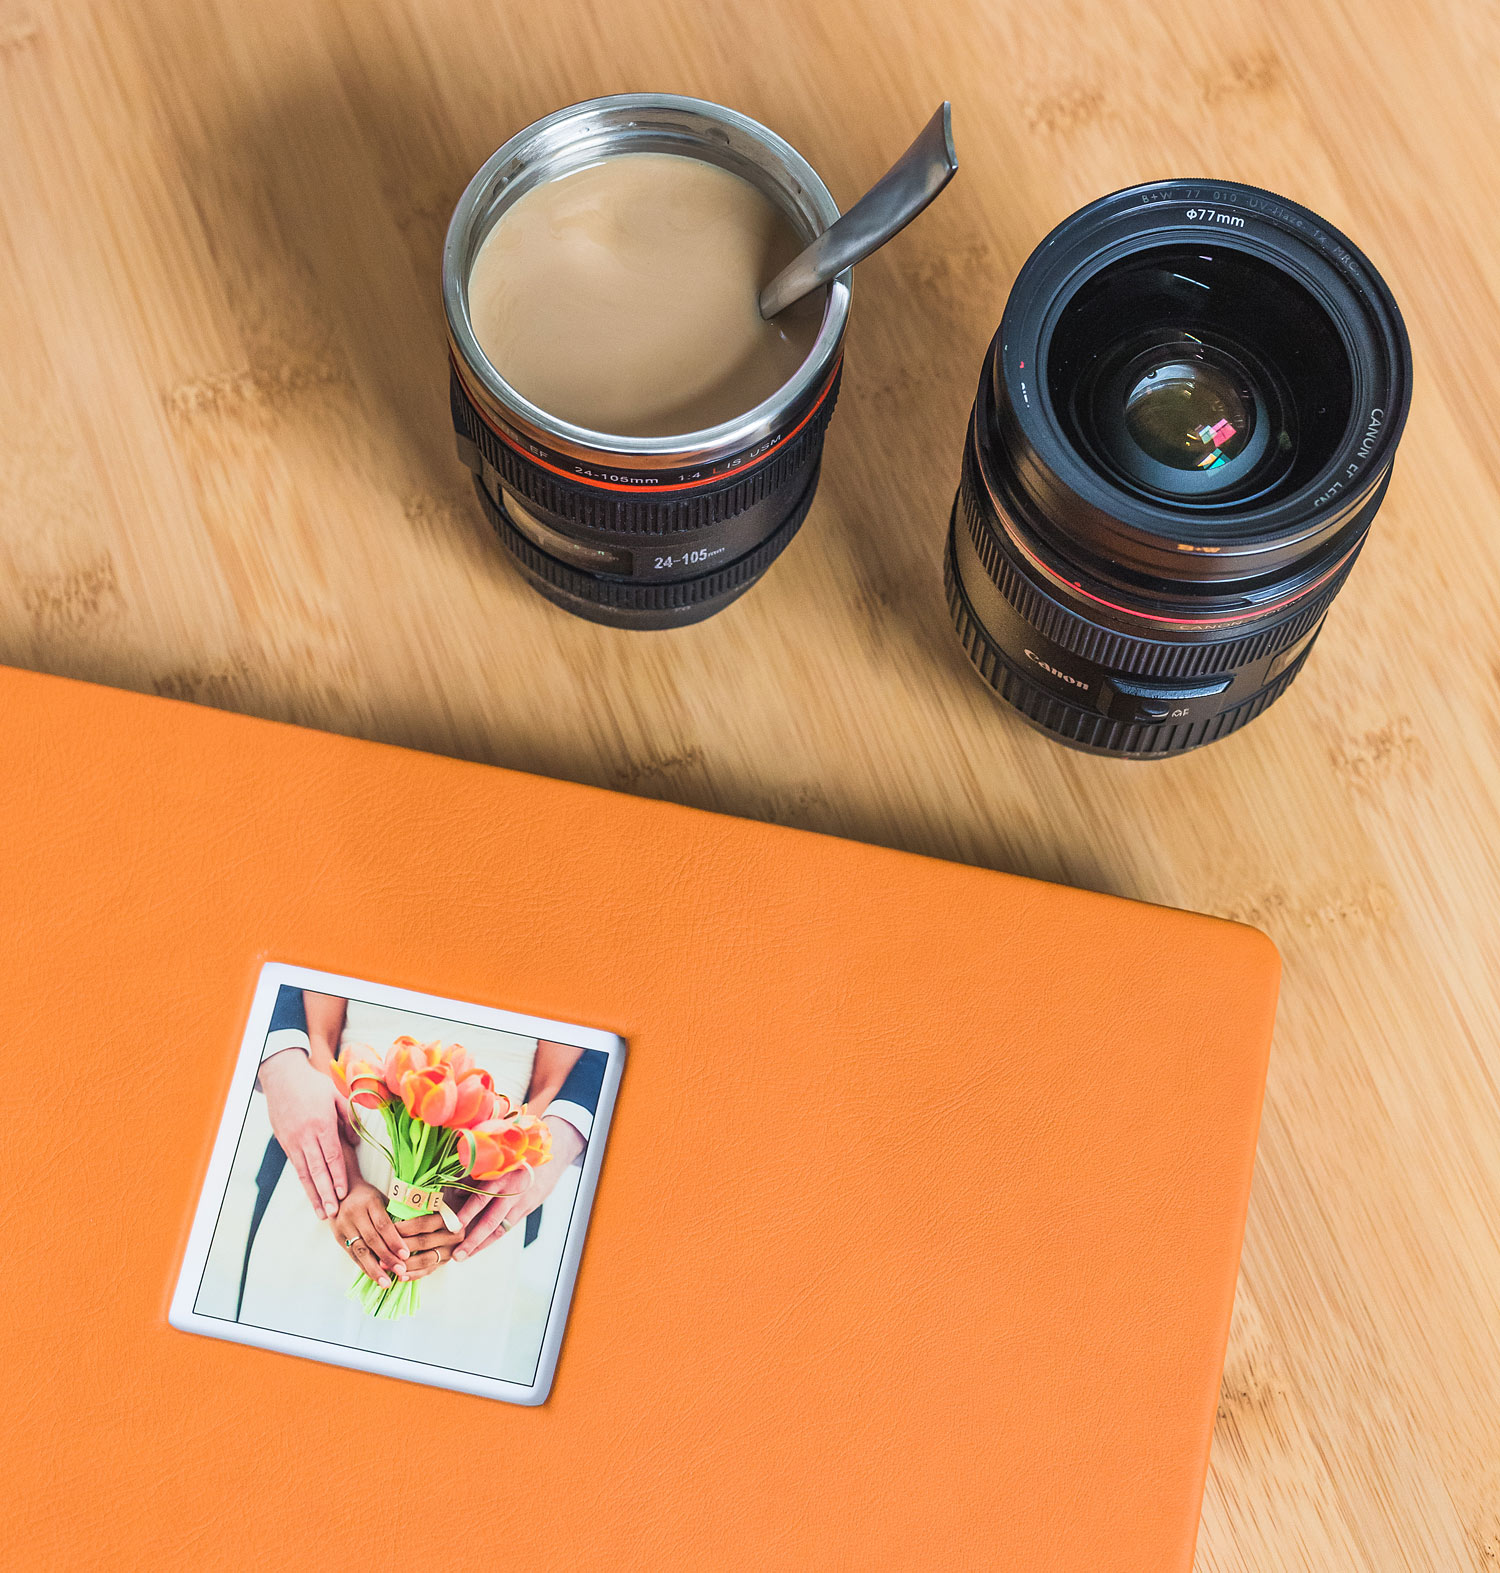 stphen-grant-photography-coffee.jpg